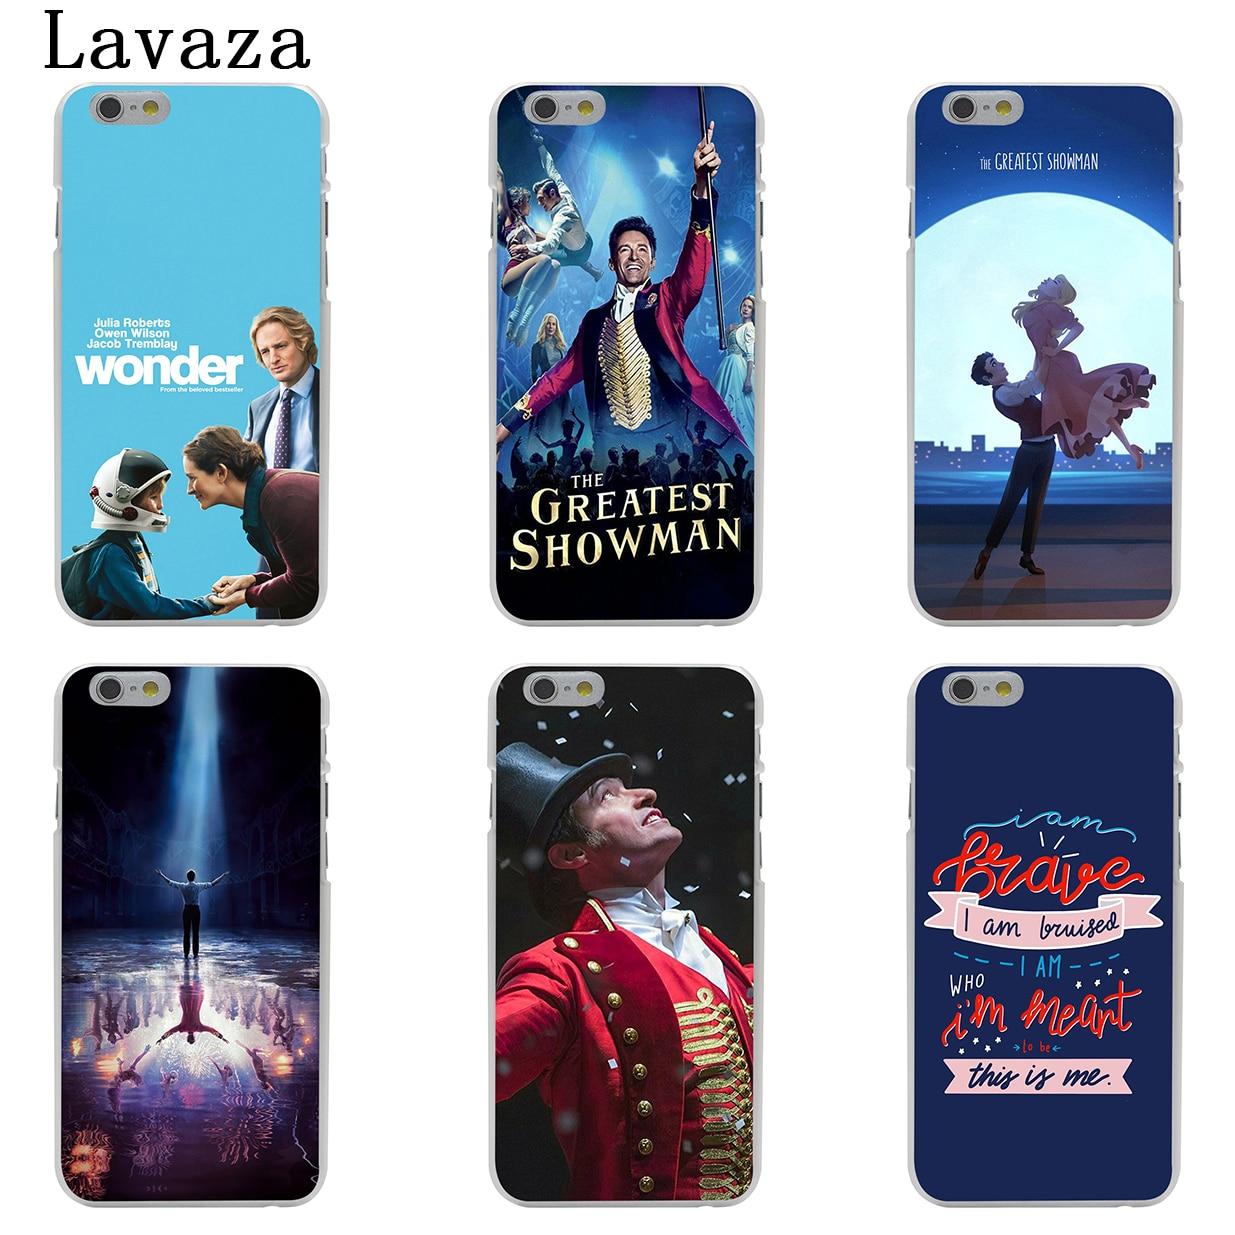 the greatest showman phone case samsung s6